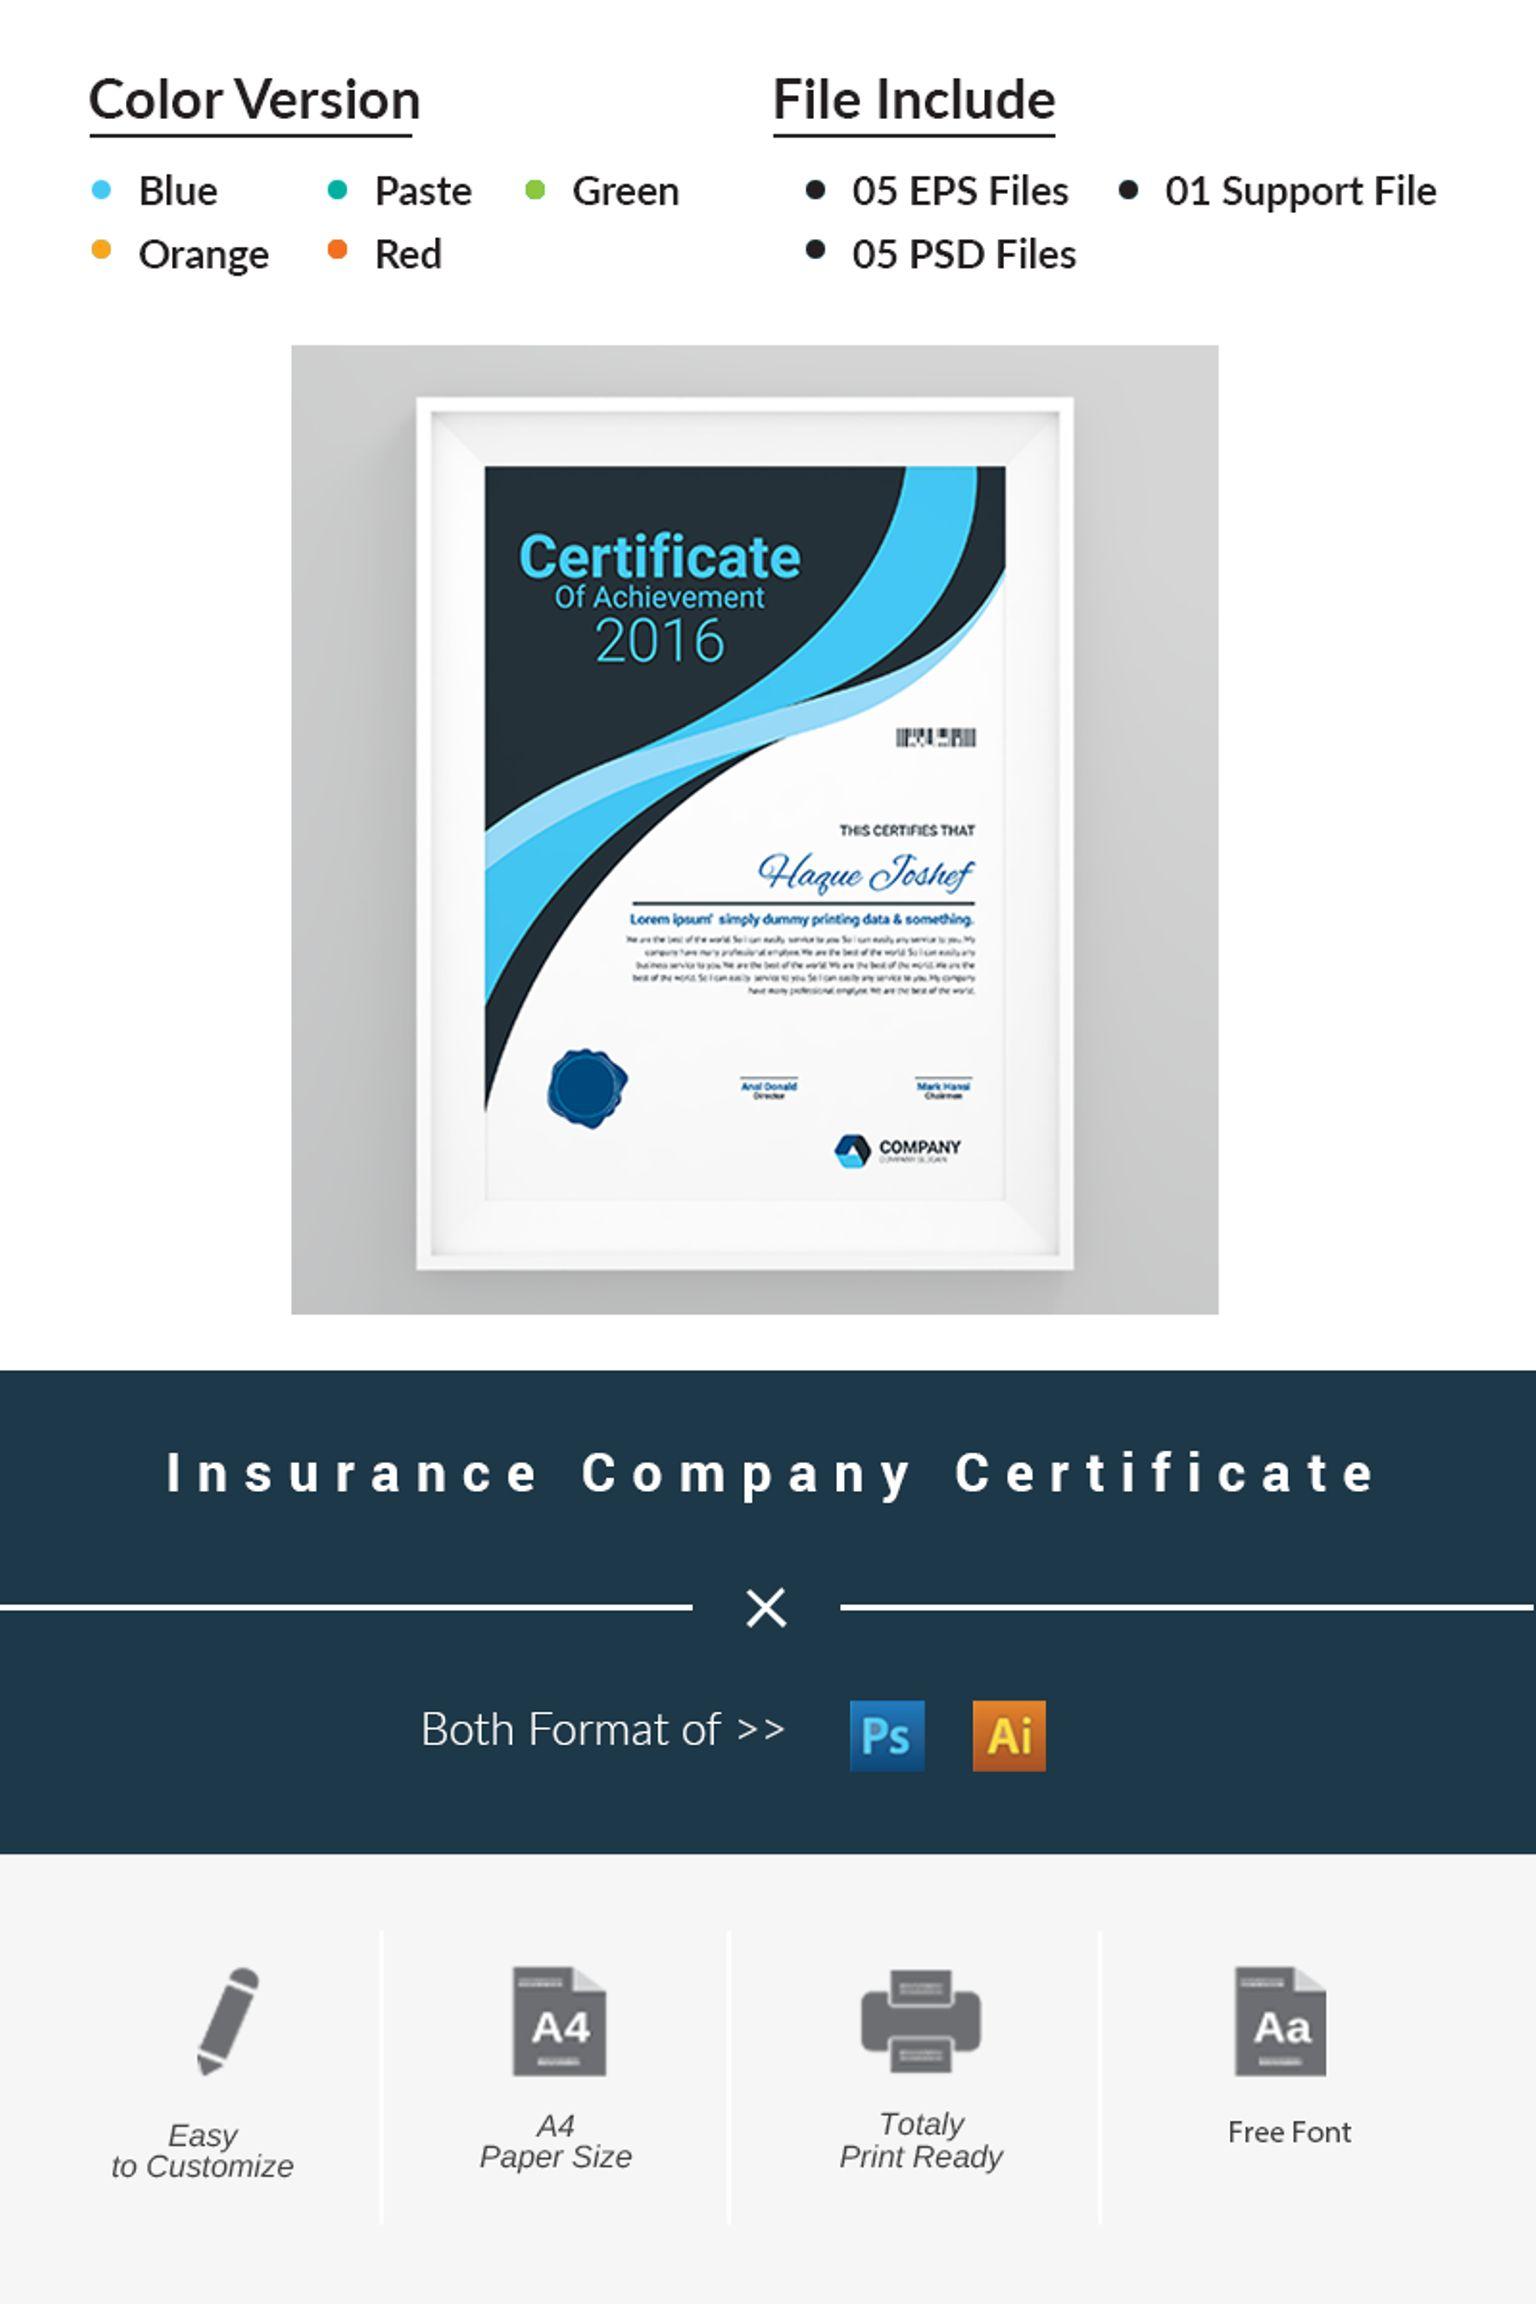 Insurance Company Certificate Template 66464